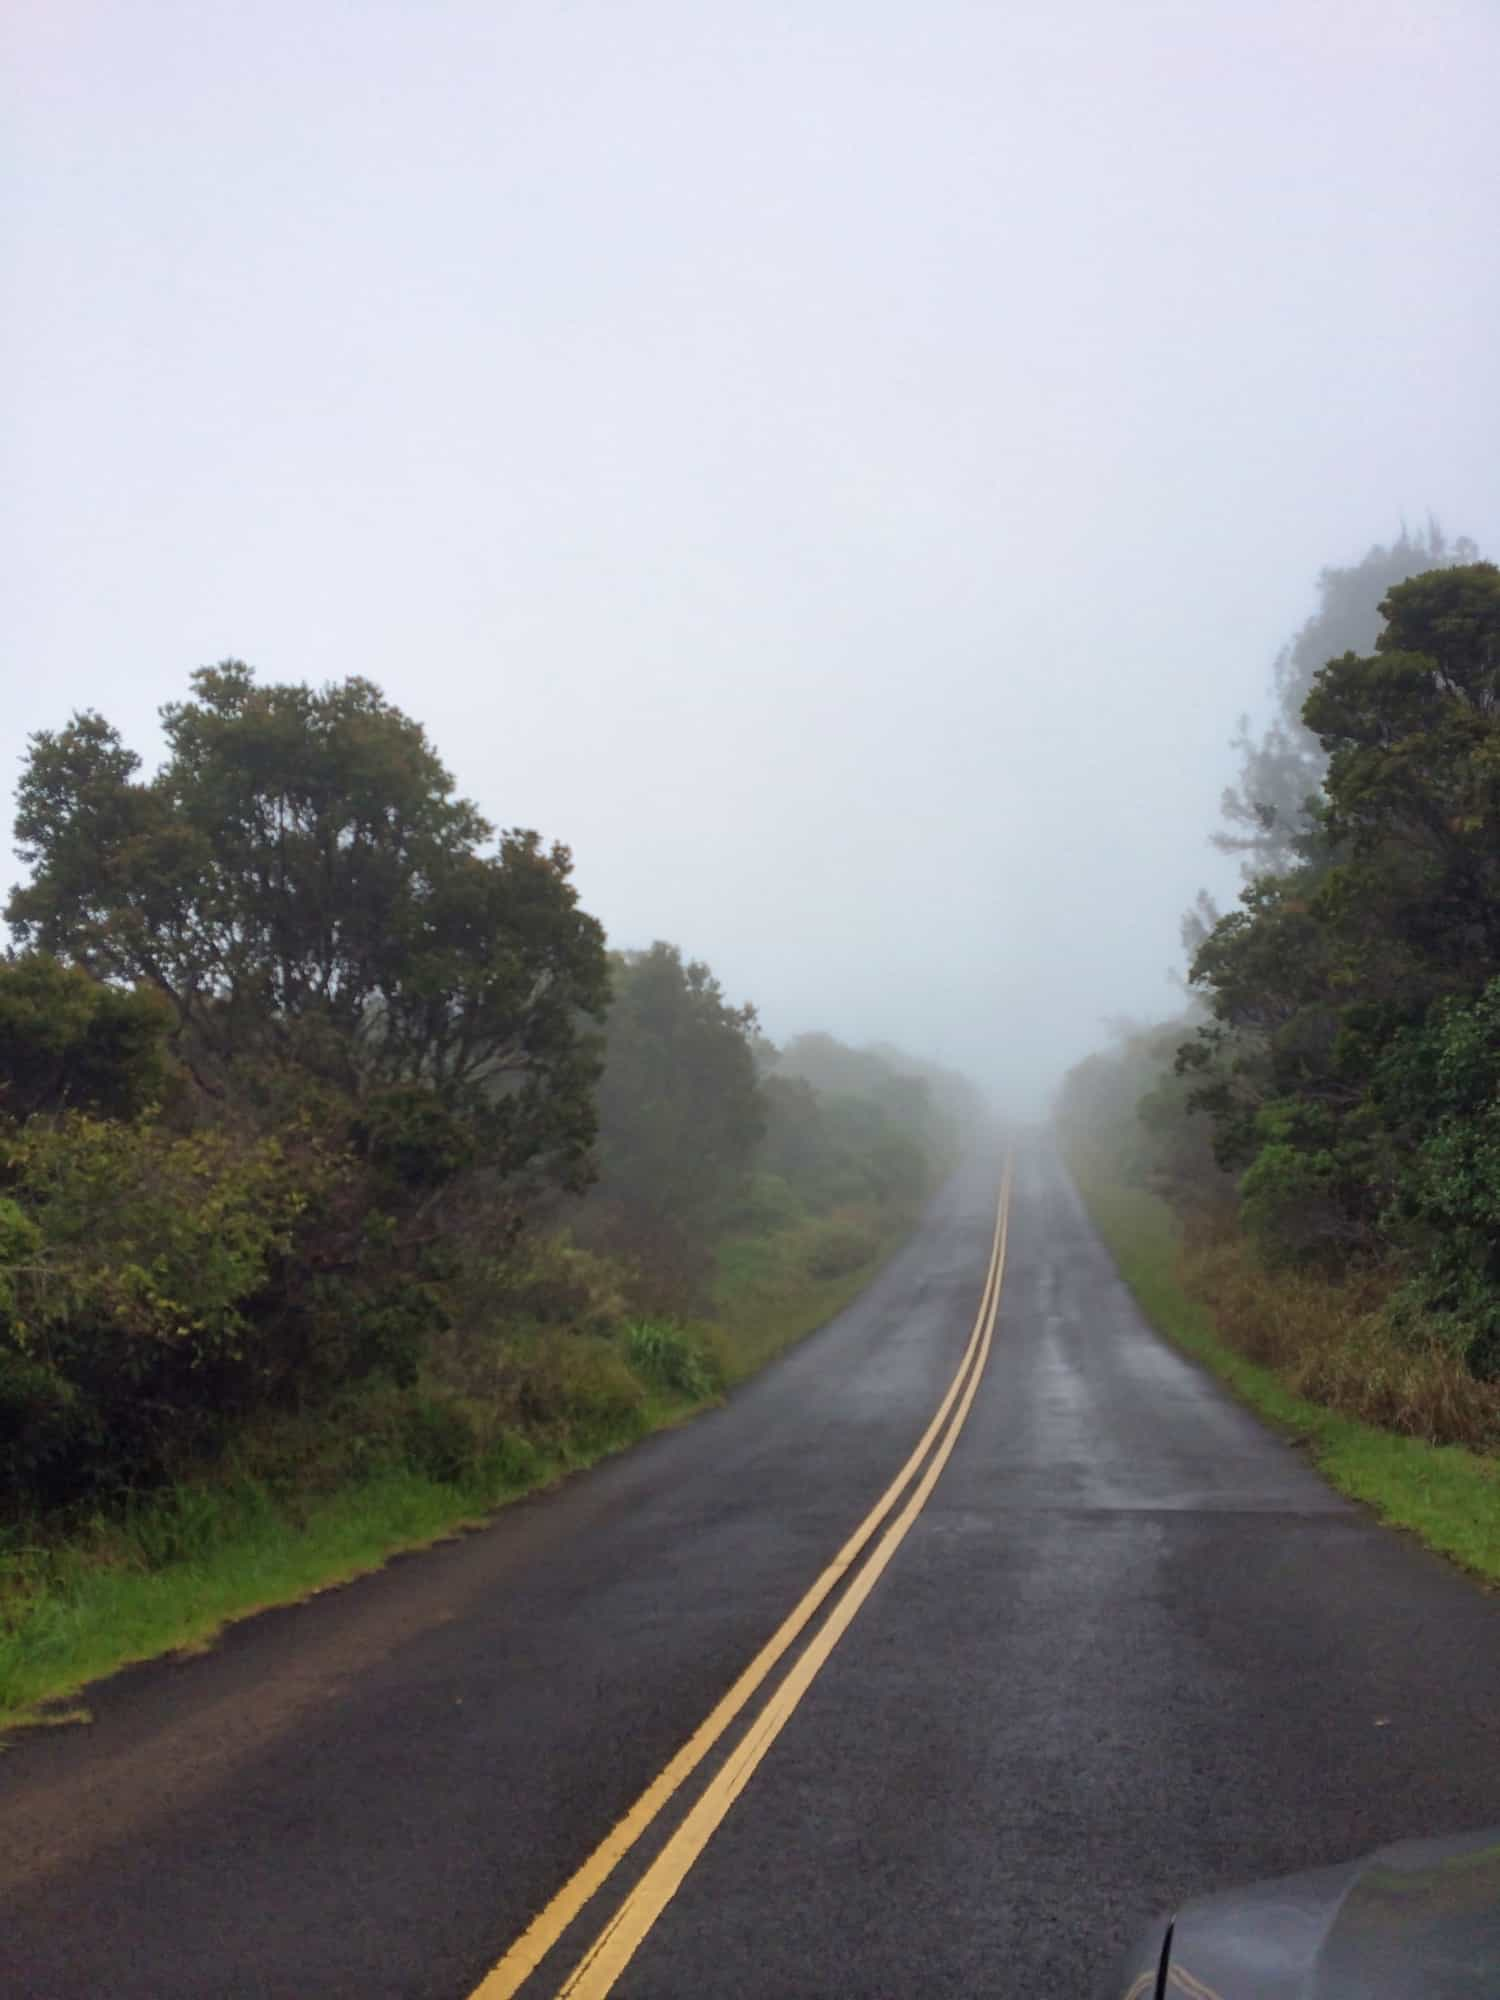 3 Days in Kauai - Wai'Ale'Ale